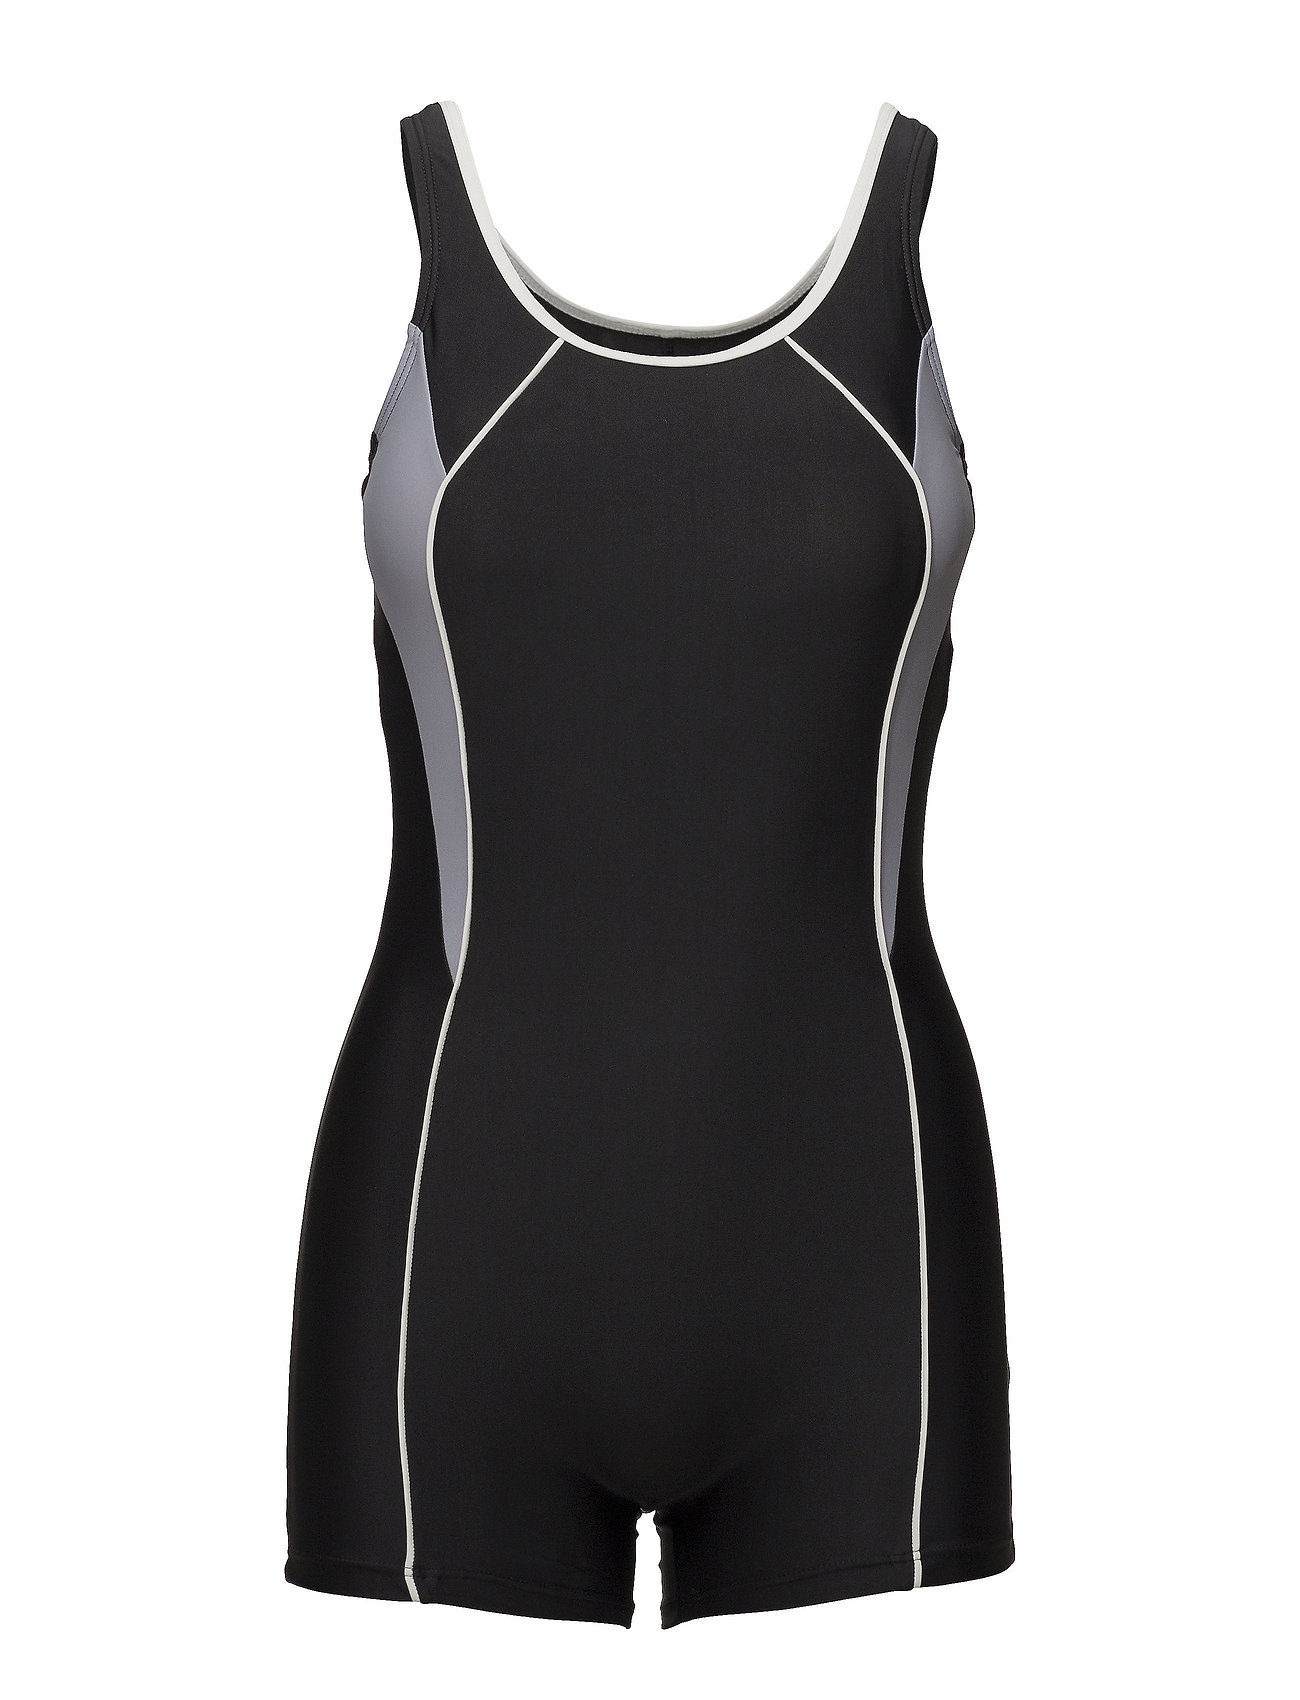 Wiki Swimsuit Regina Sport - BLACK/WHITE